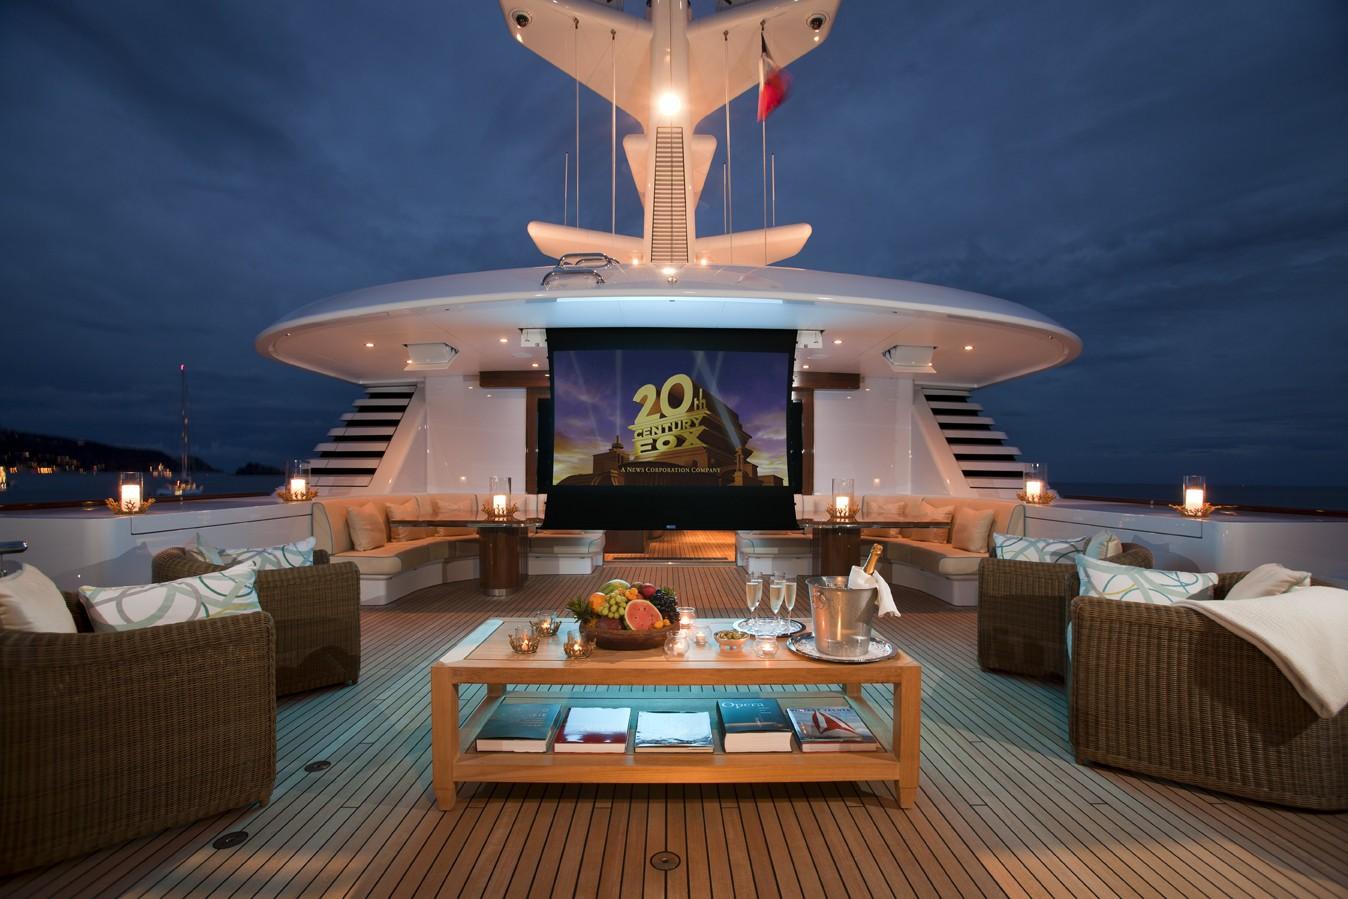 Sun Deck Movie Cinema On Board Yacht LADY BRITT